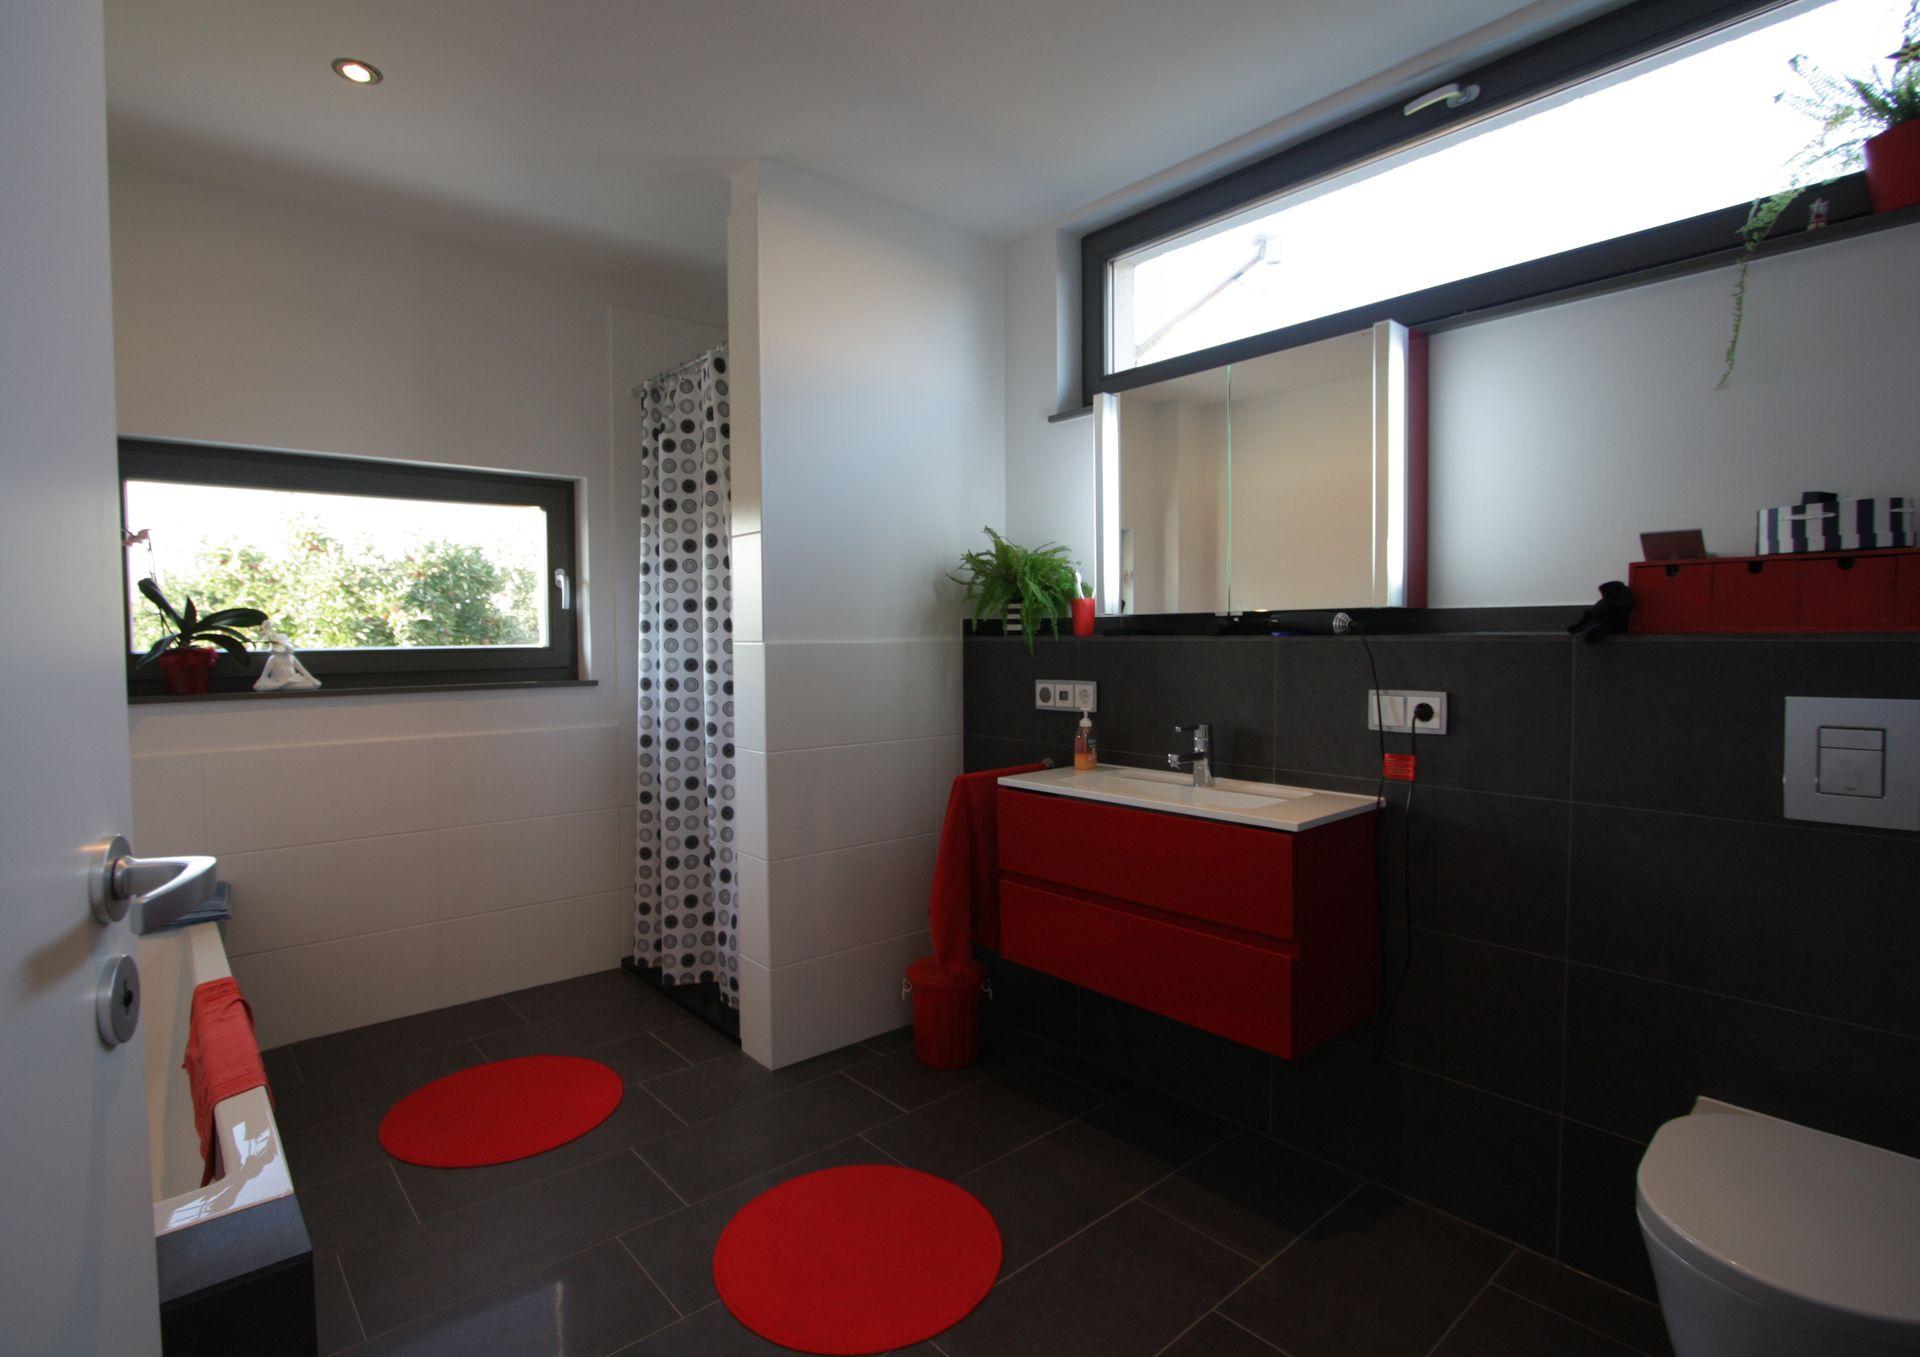 helles badezimmer in harmonischen farben. Black Bedroom Furniture Sets. Home Design Ideas